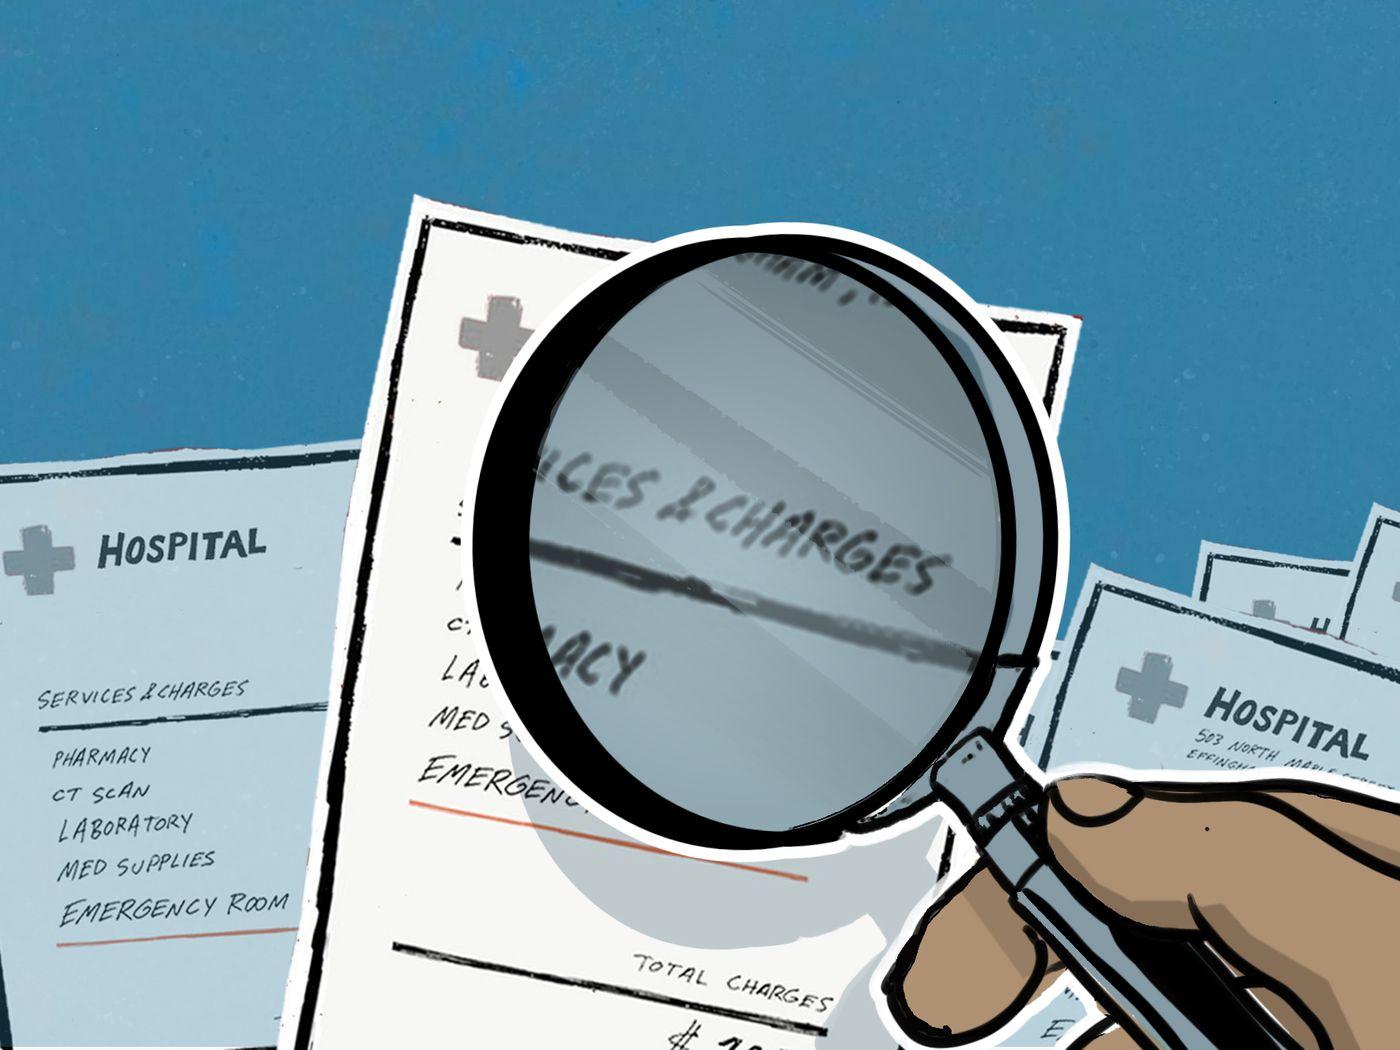 Emergency room bills: what I learned from reading 1,182 ER bills - Vox